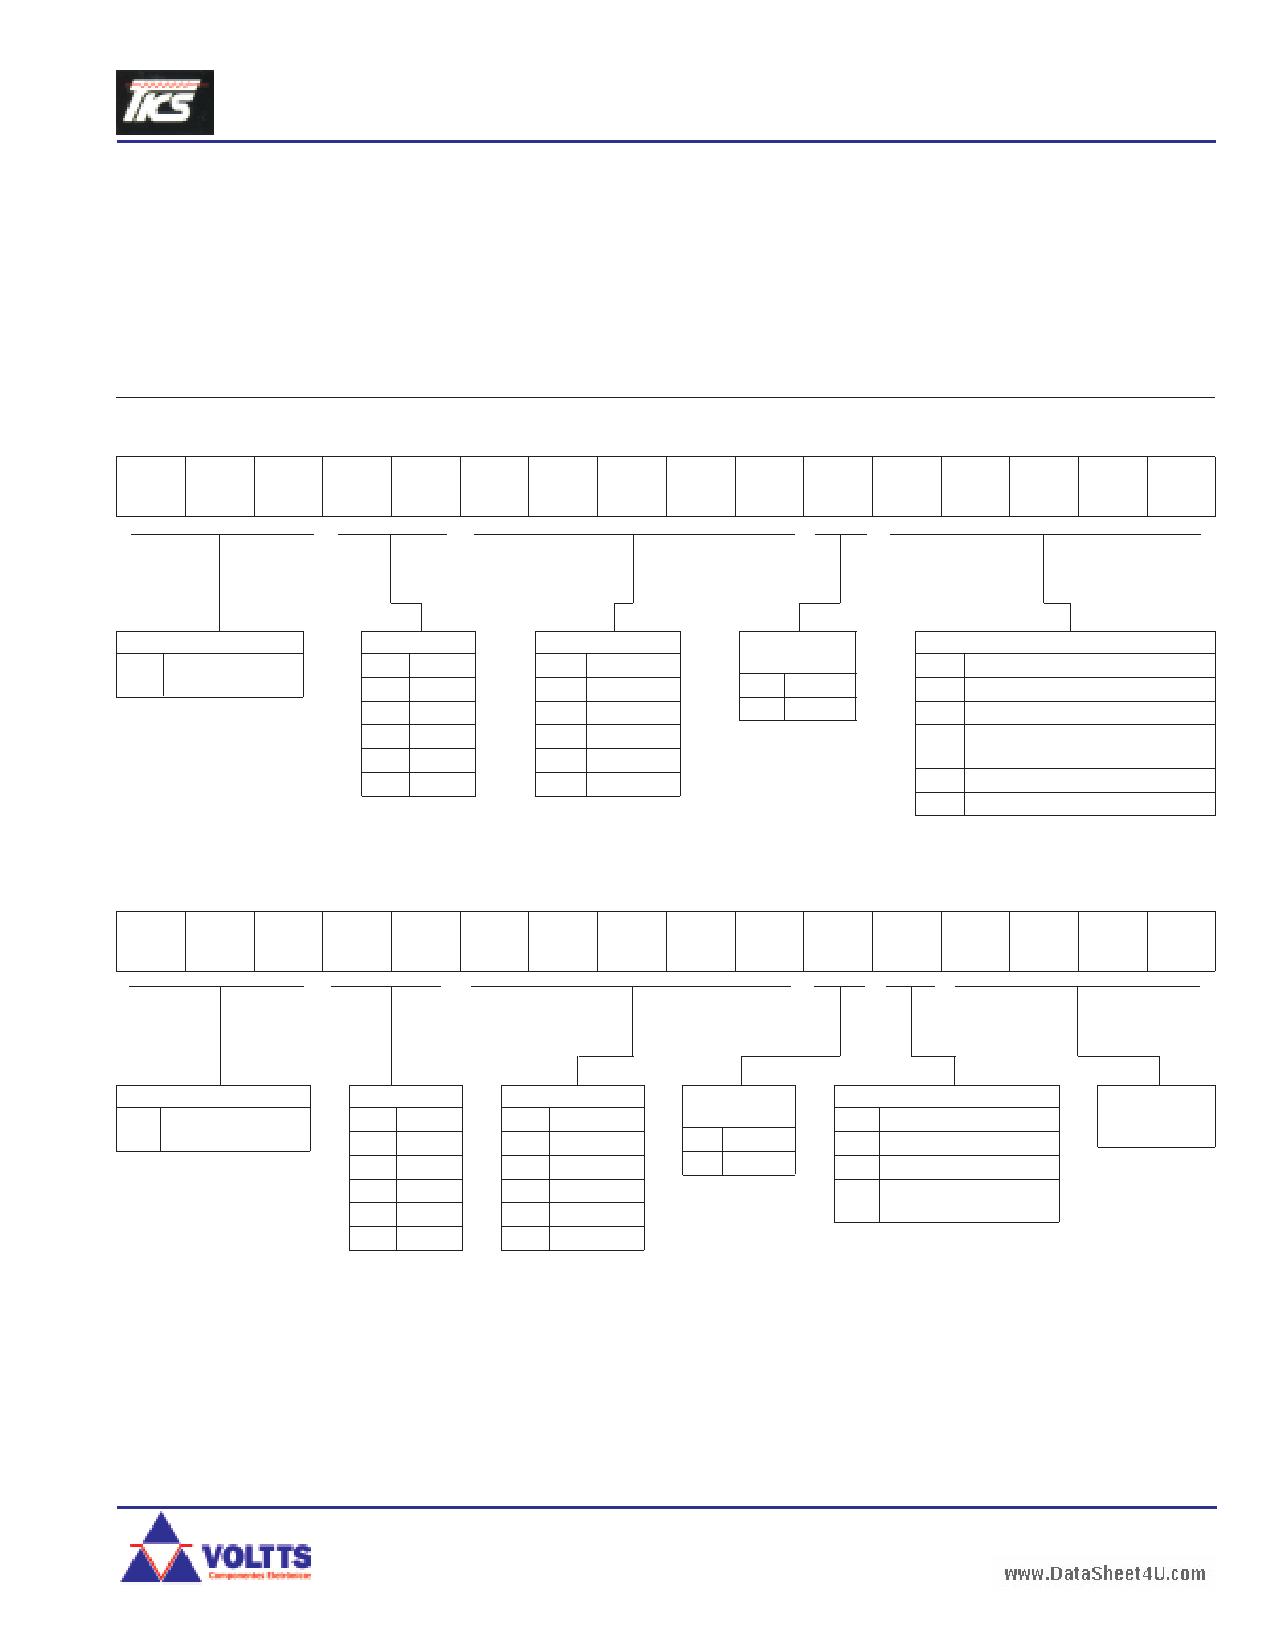 SCK-103 datasheet pinout